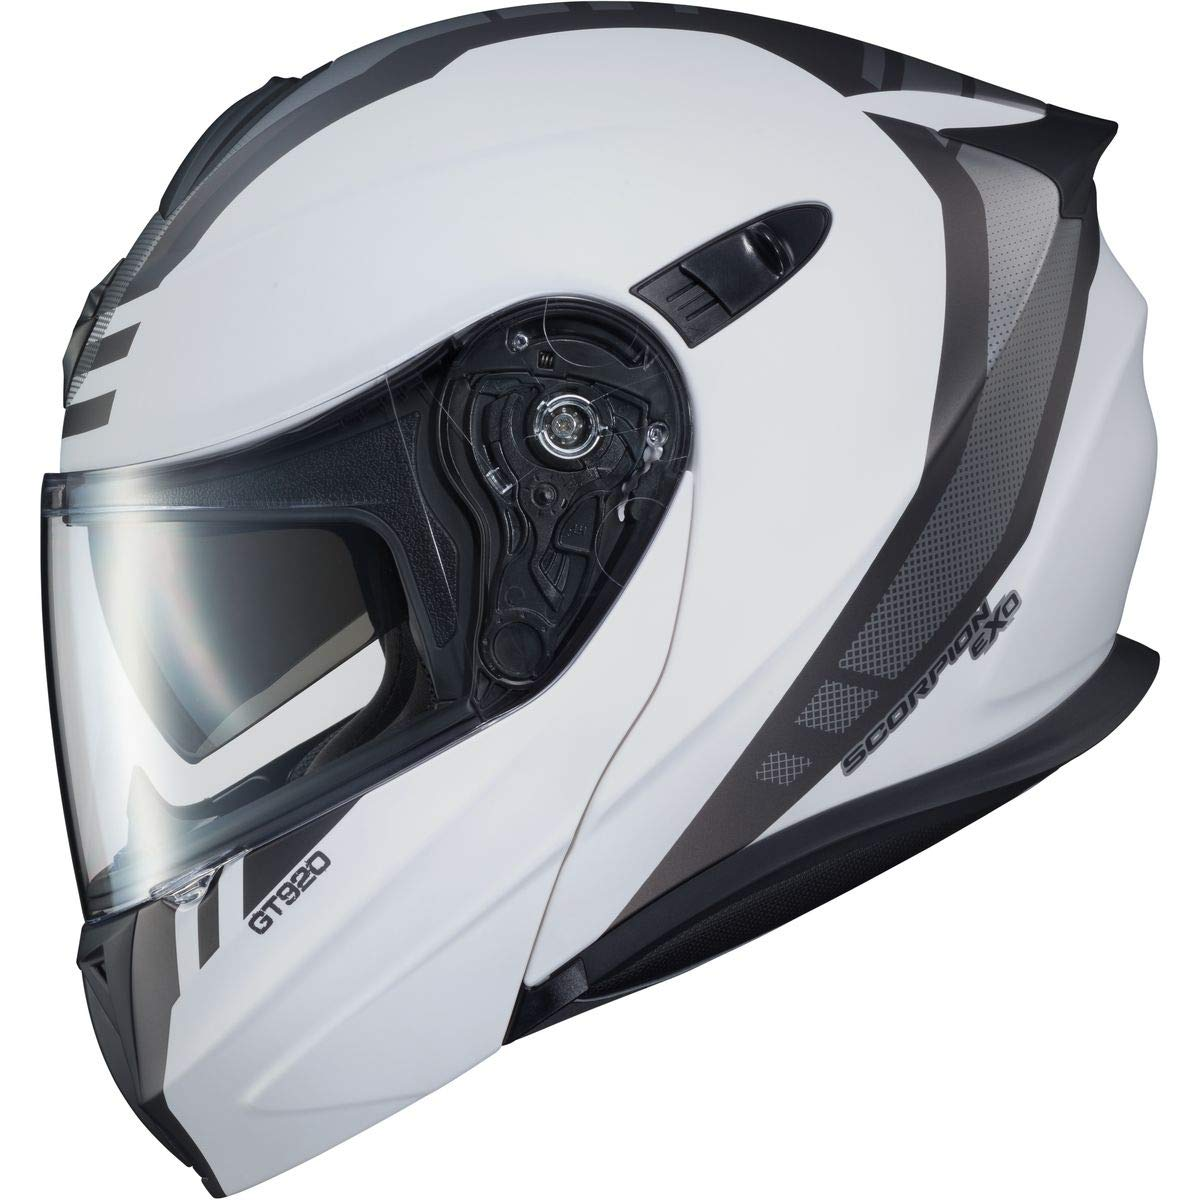 Large Matte Black//Dark Grey Unit Scorpion EXO-GT920 Helmet